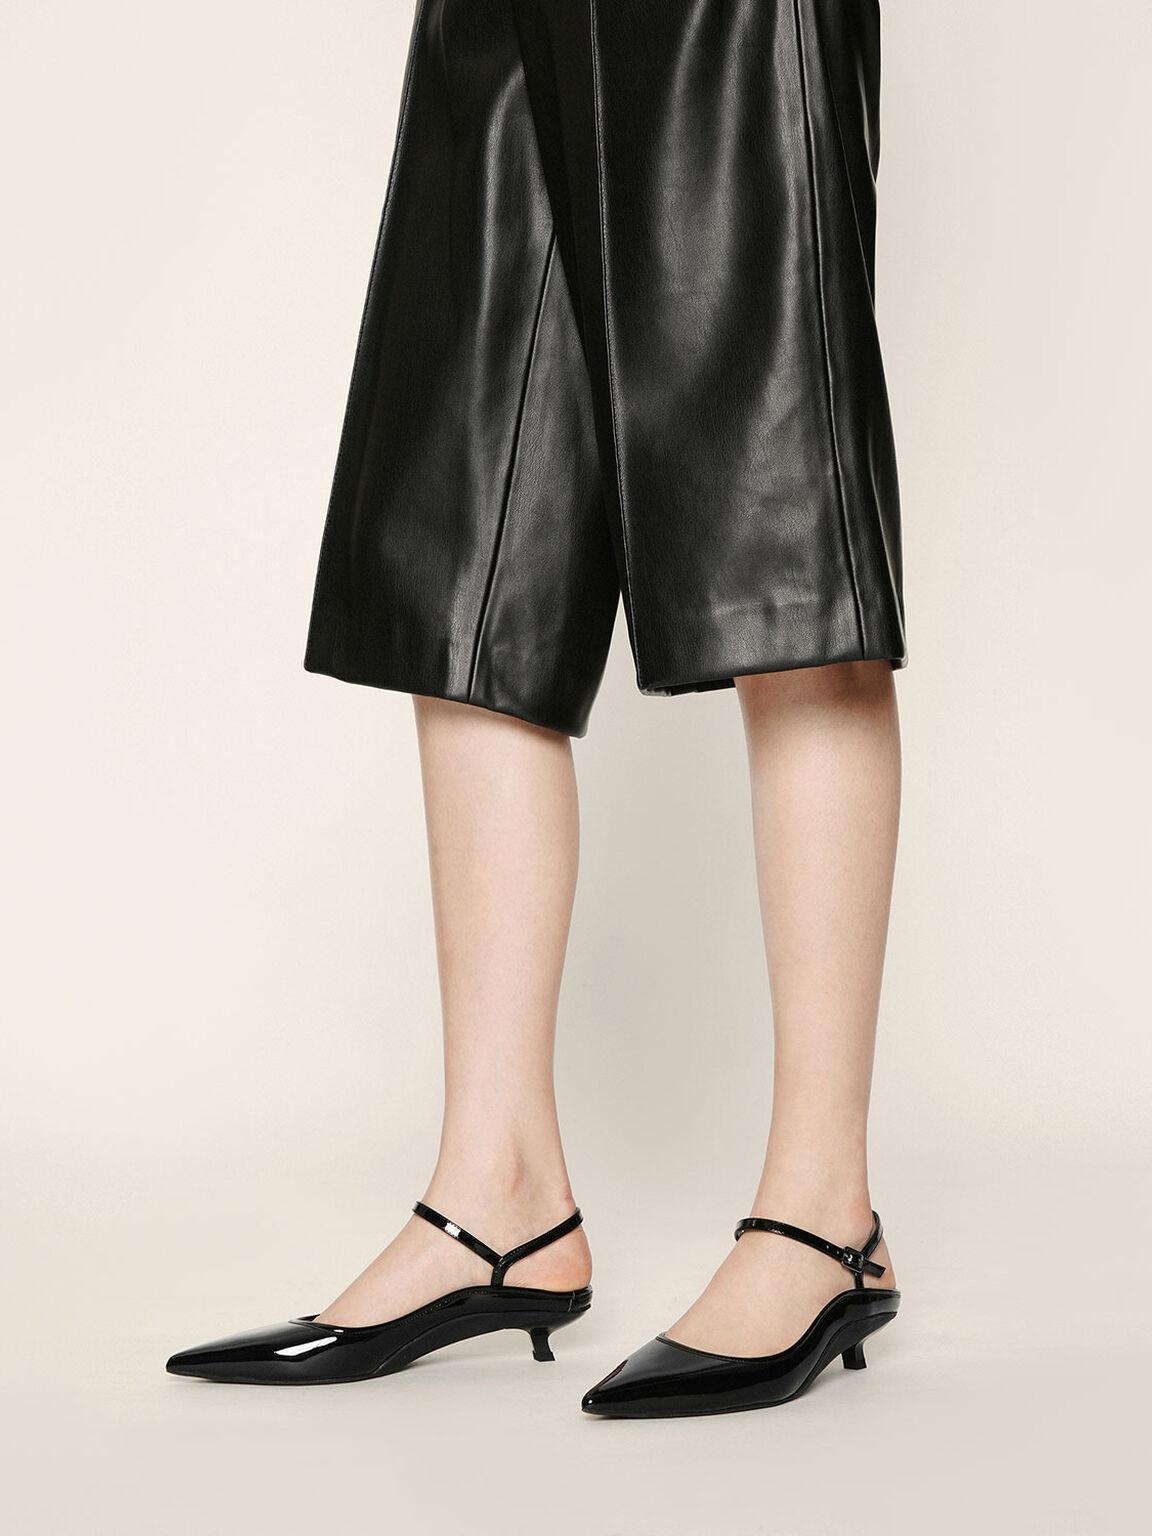 Patent Ankle Strap Kitten Heel Mules, Black, hi-res